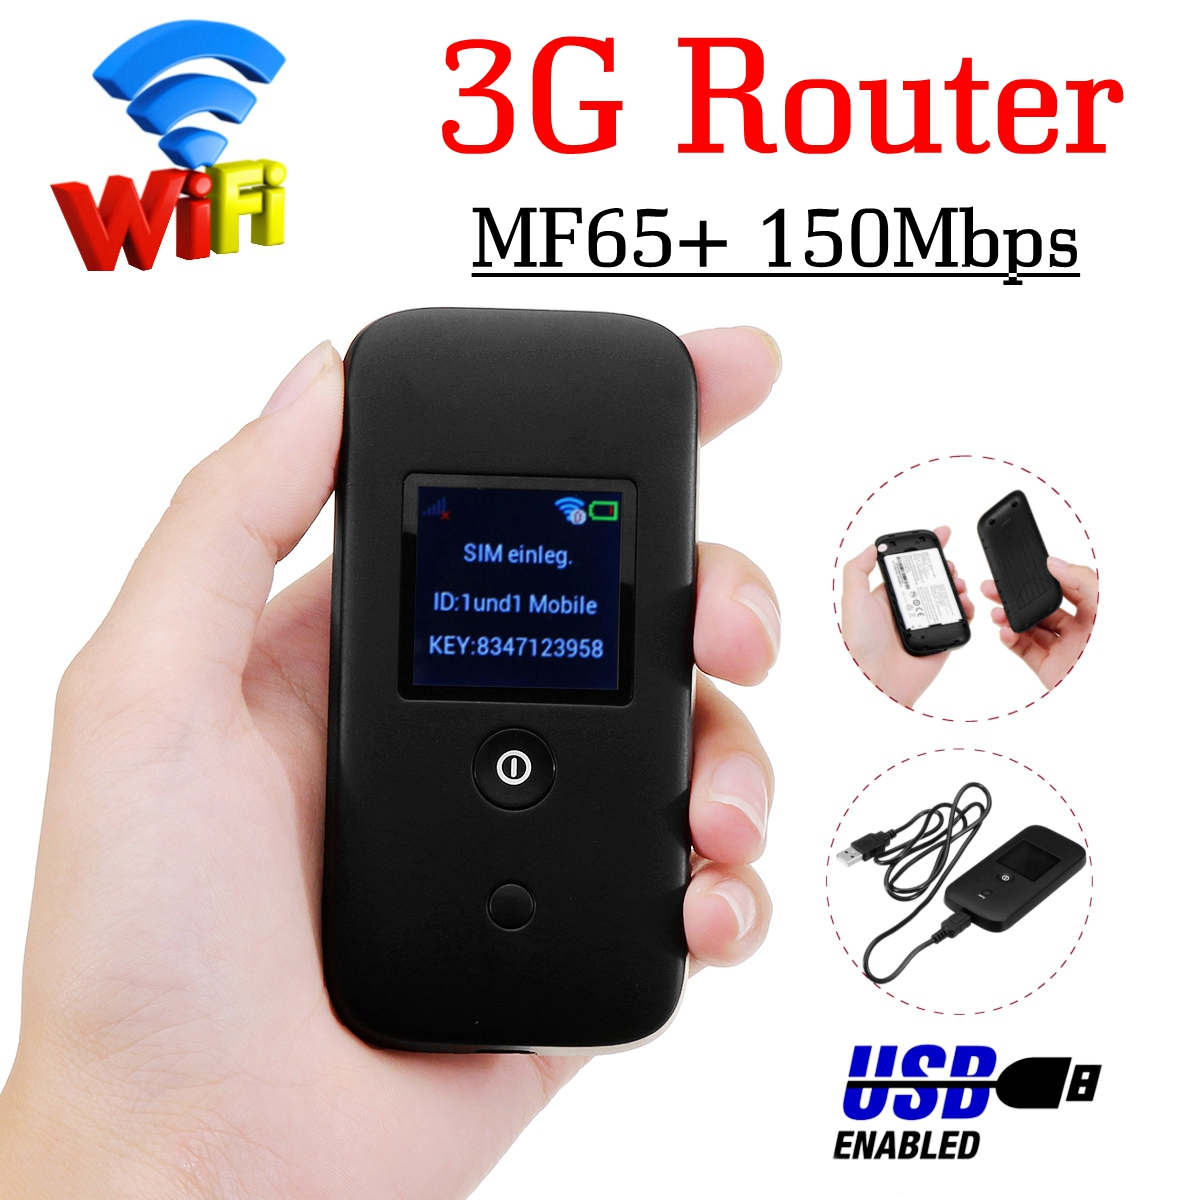 MF65+ 150Mbps 3G Wifi Router Car Mobile Wifi Hotspot Wireless Broadband Mifi Unlockeds Modem With Sim Card Slot цена в Москве и Питере